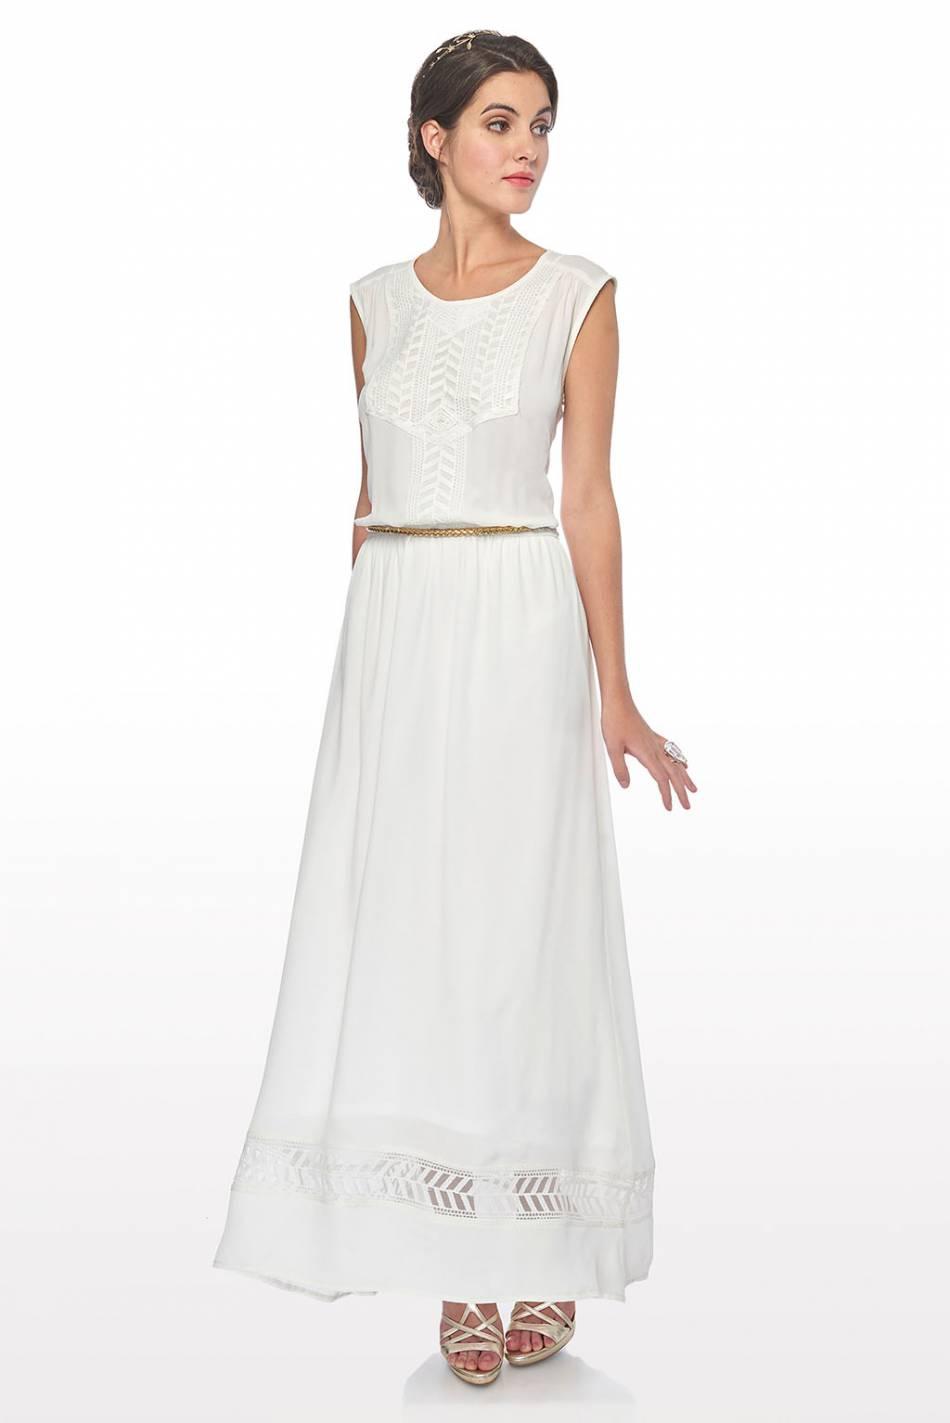 weddingirl la robe longue voile puretrend. Black Bedroom Furniture Sets. Home Design Ideas